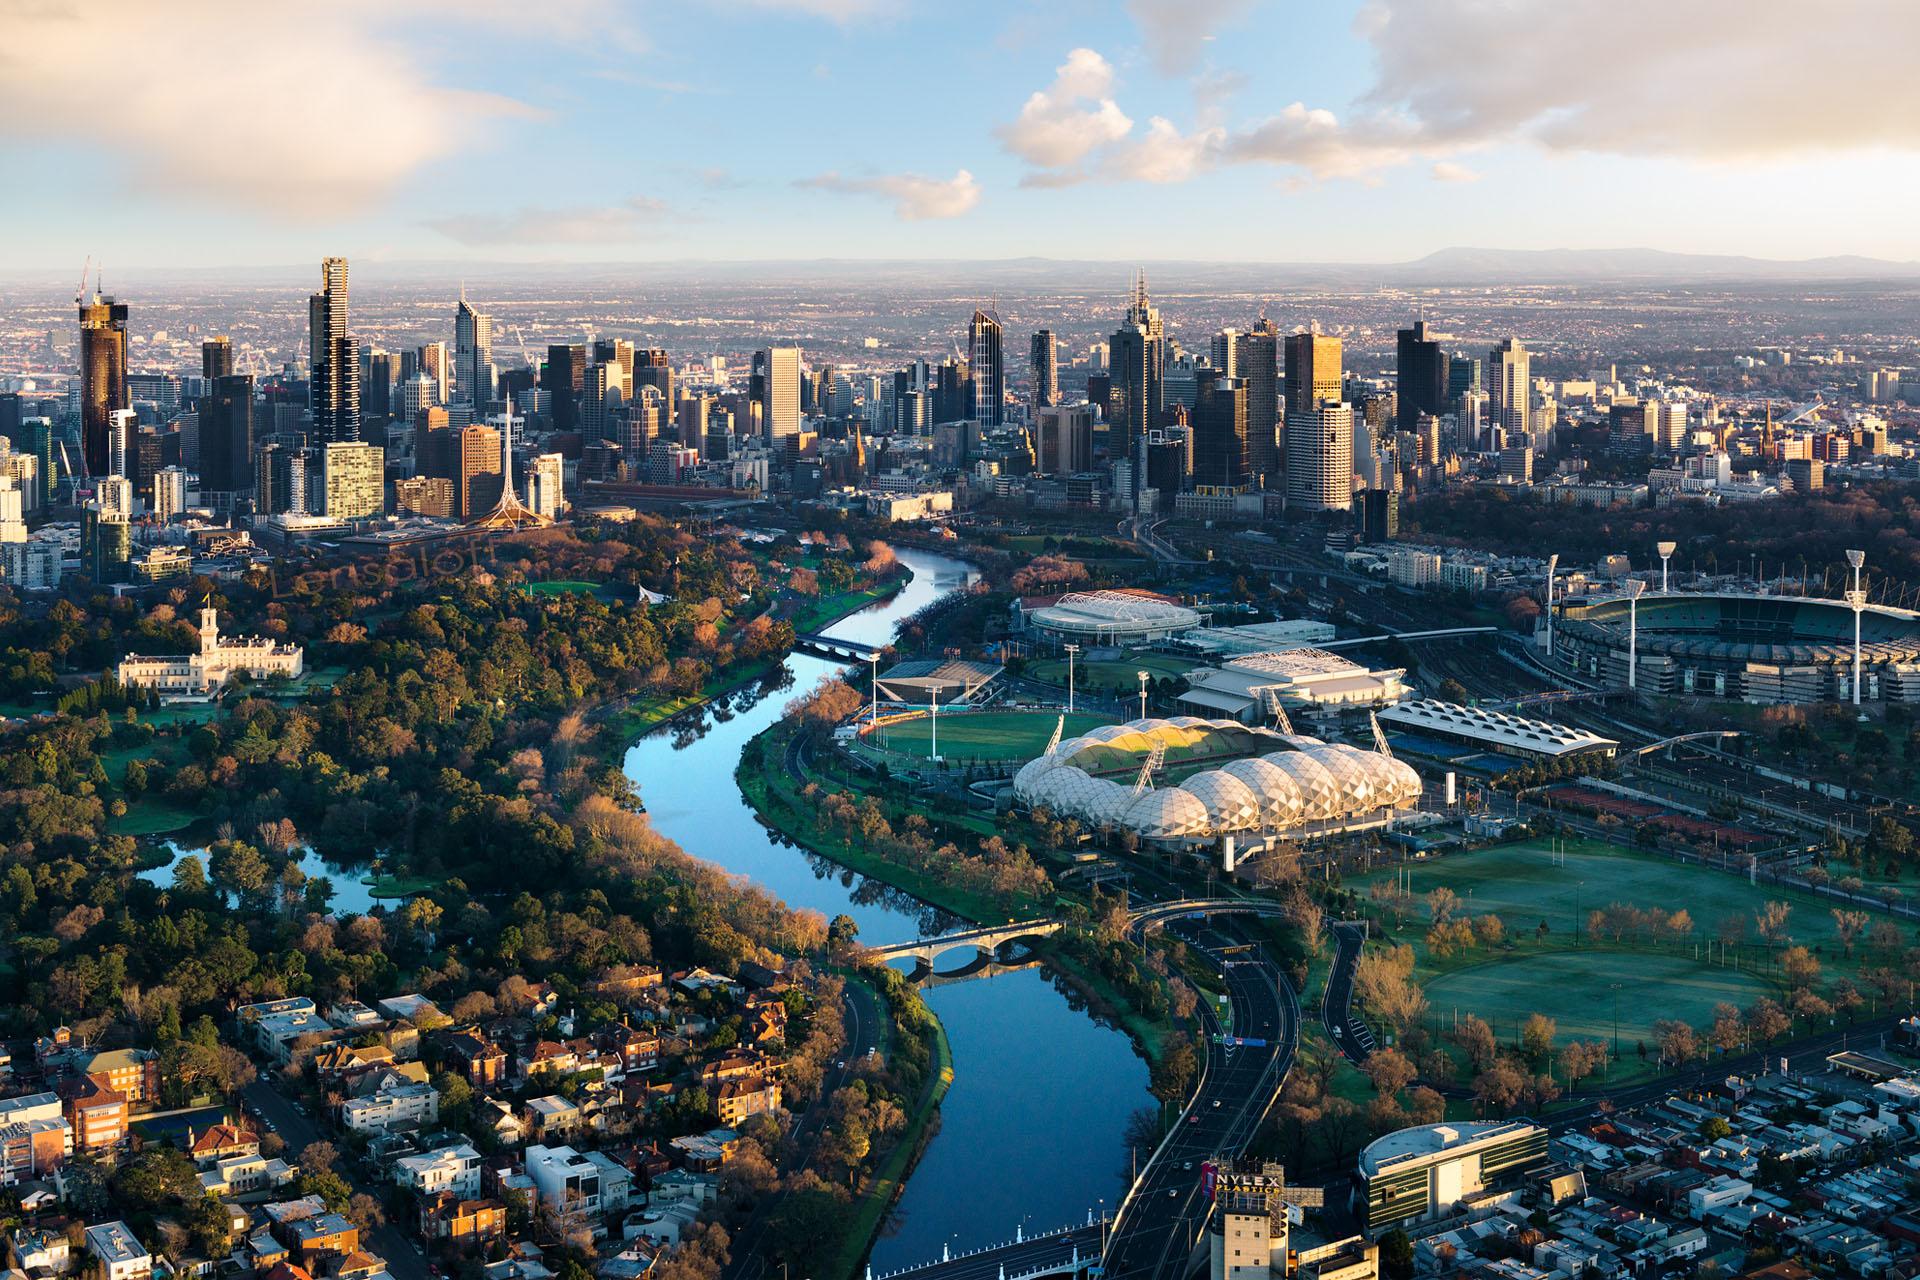 Lensaloft Aerial Photography